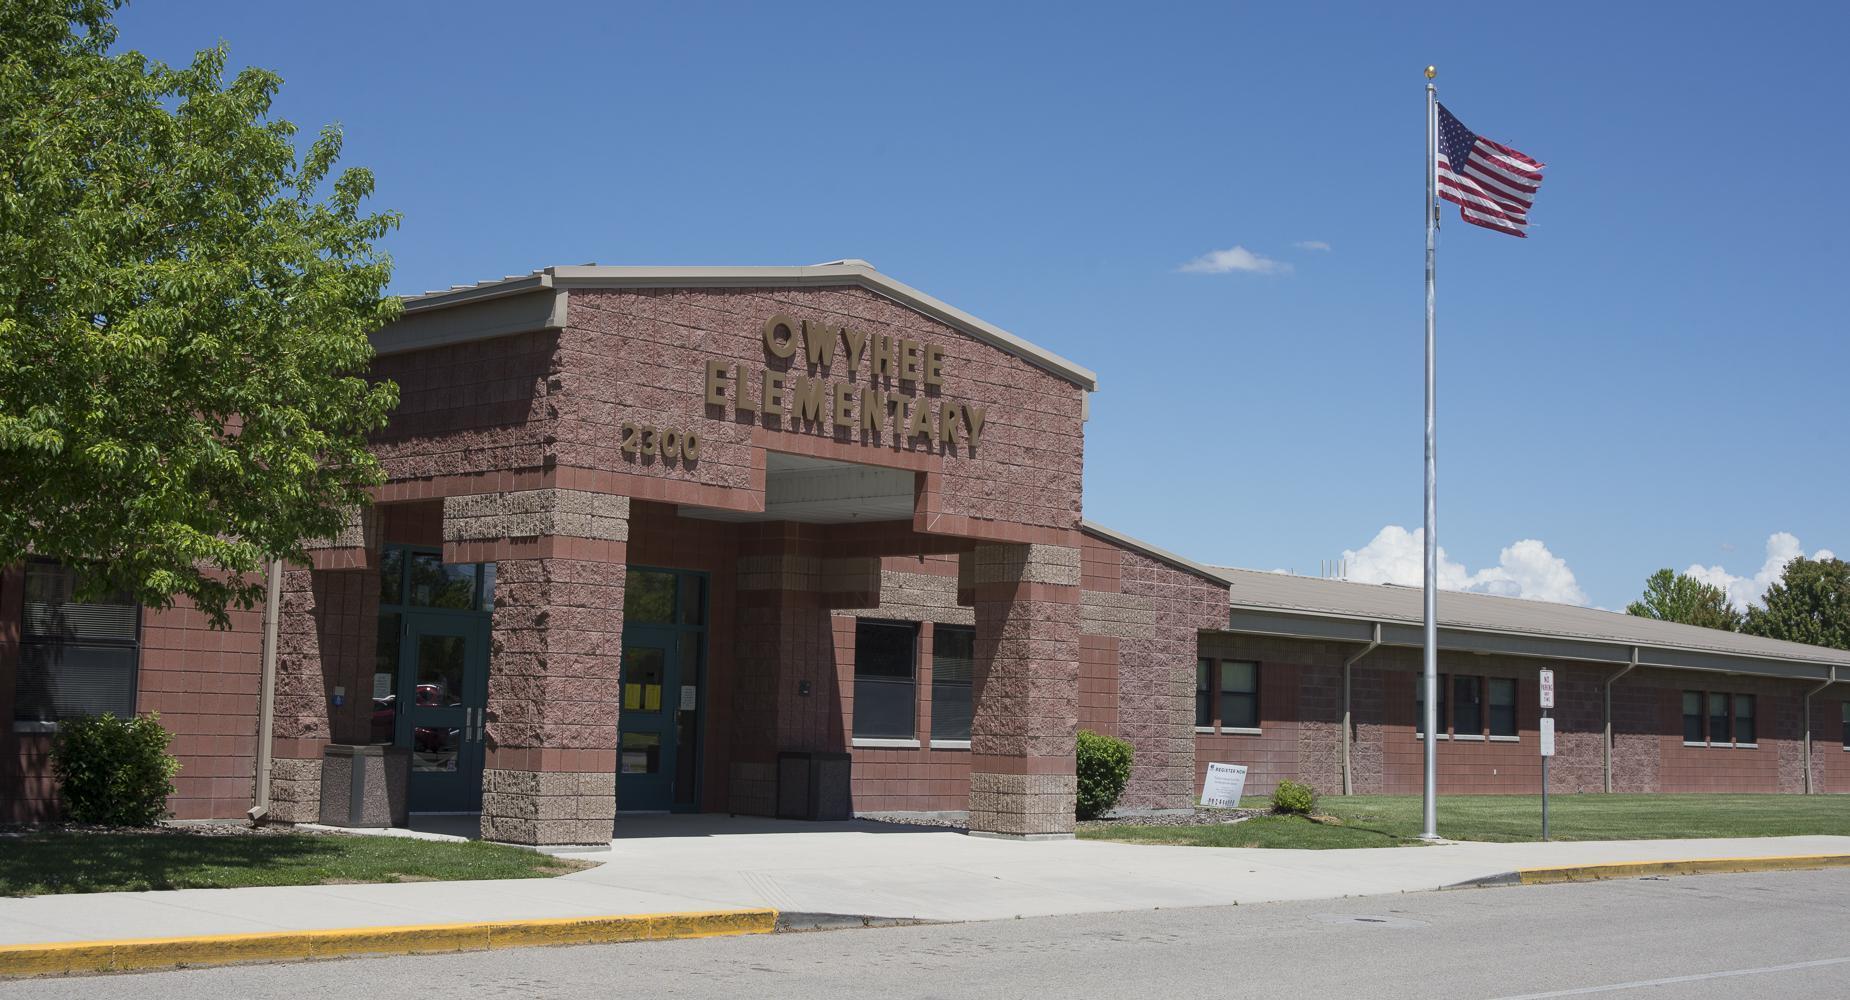 Owyhee Elementary exterior